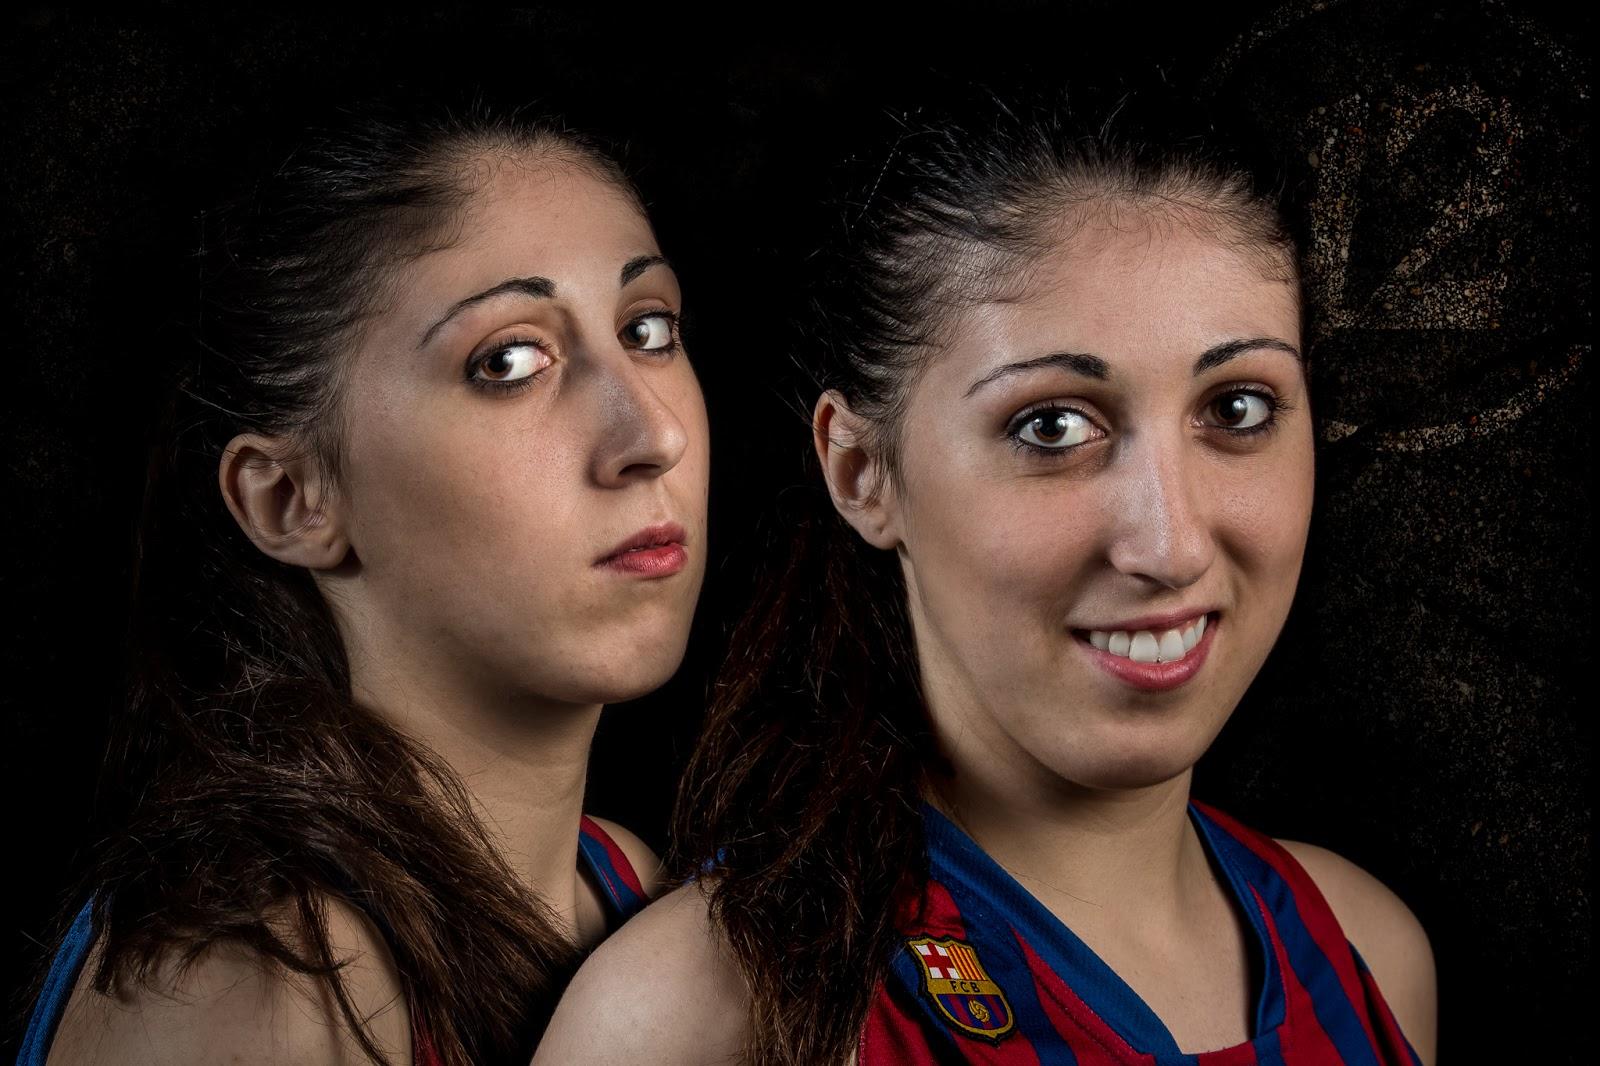 Laia 12 - CBS Barça Senior Femenino A - 2013 :: 2 x Canon EOS 5D MkIII | ISO100 | Canon 24-105 @40&45mm | f/11| 1/60s